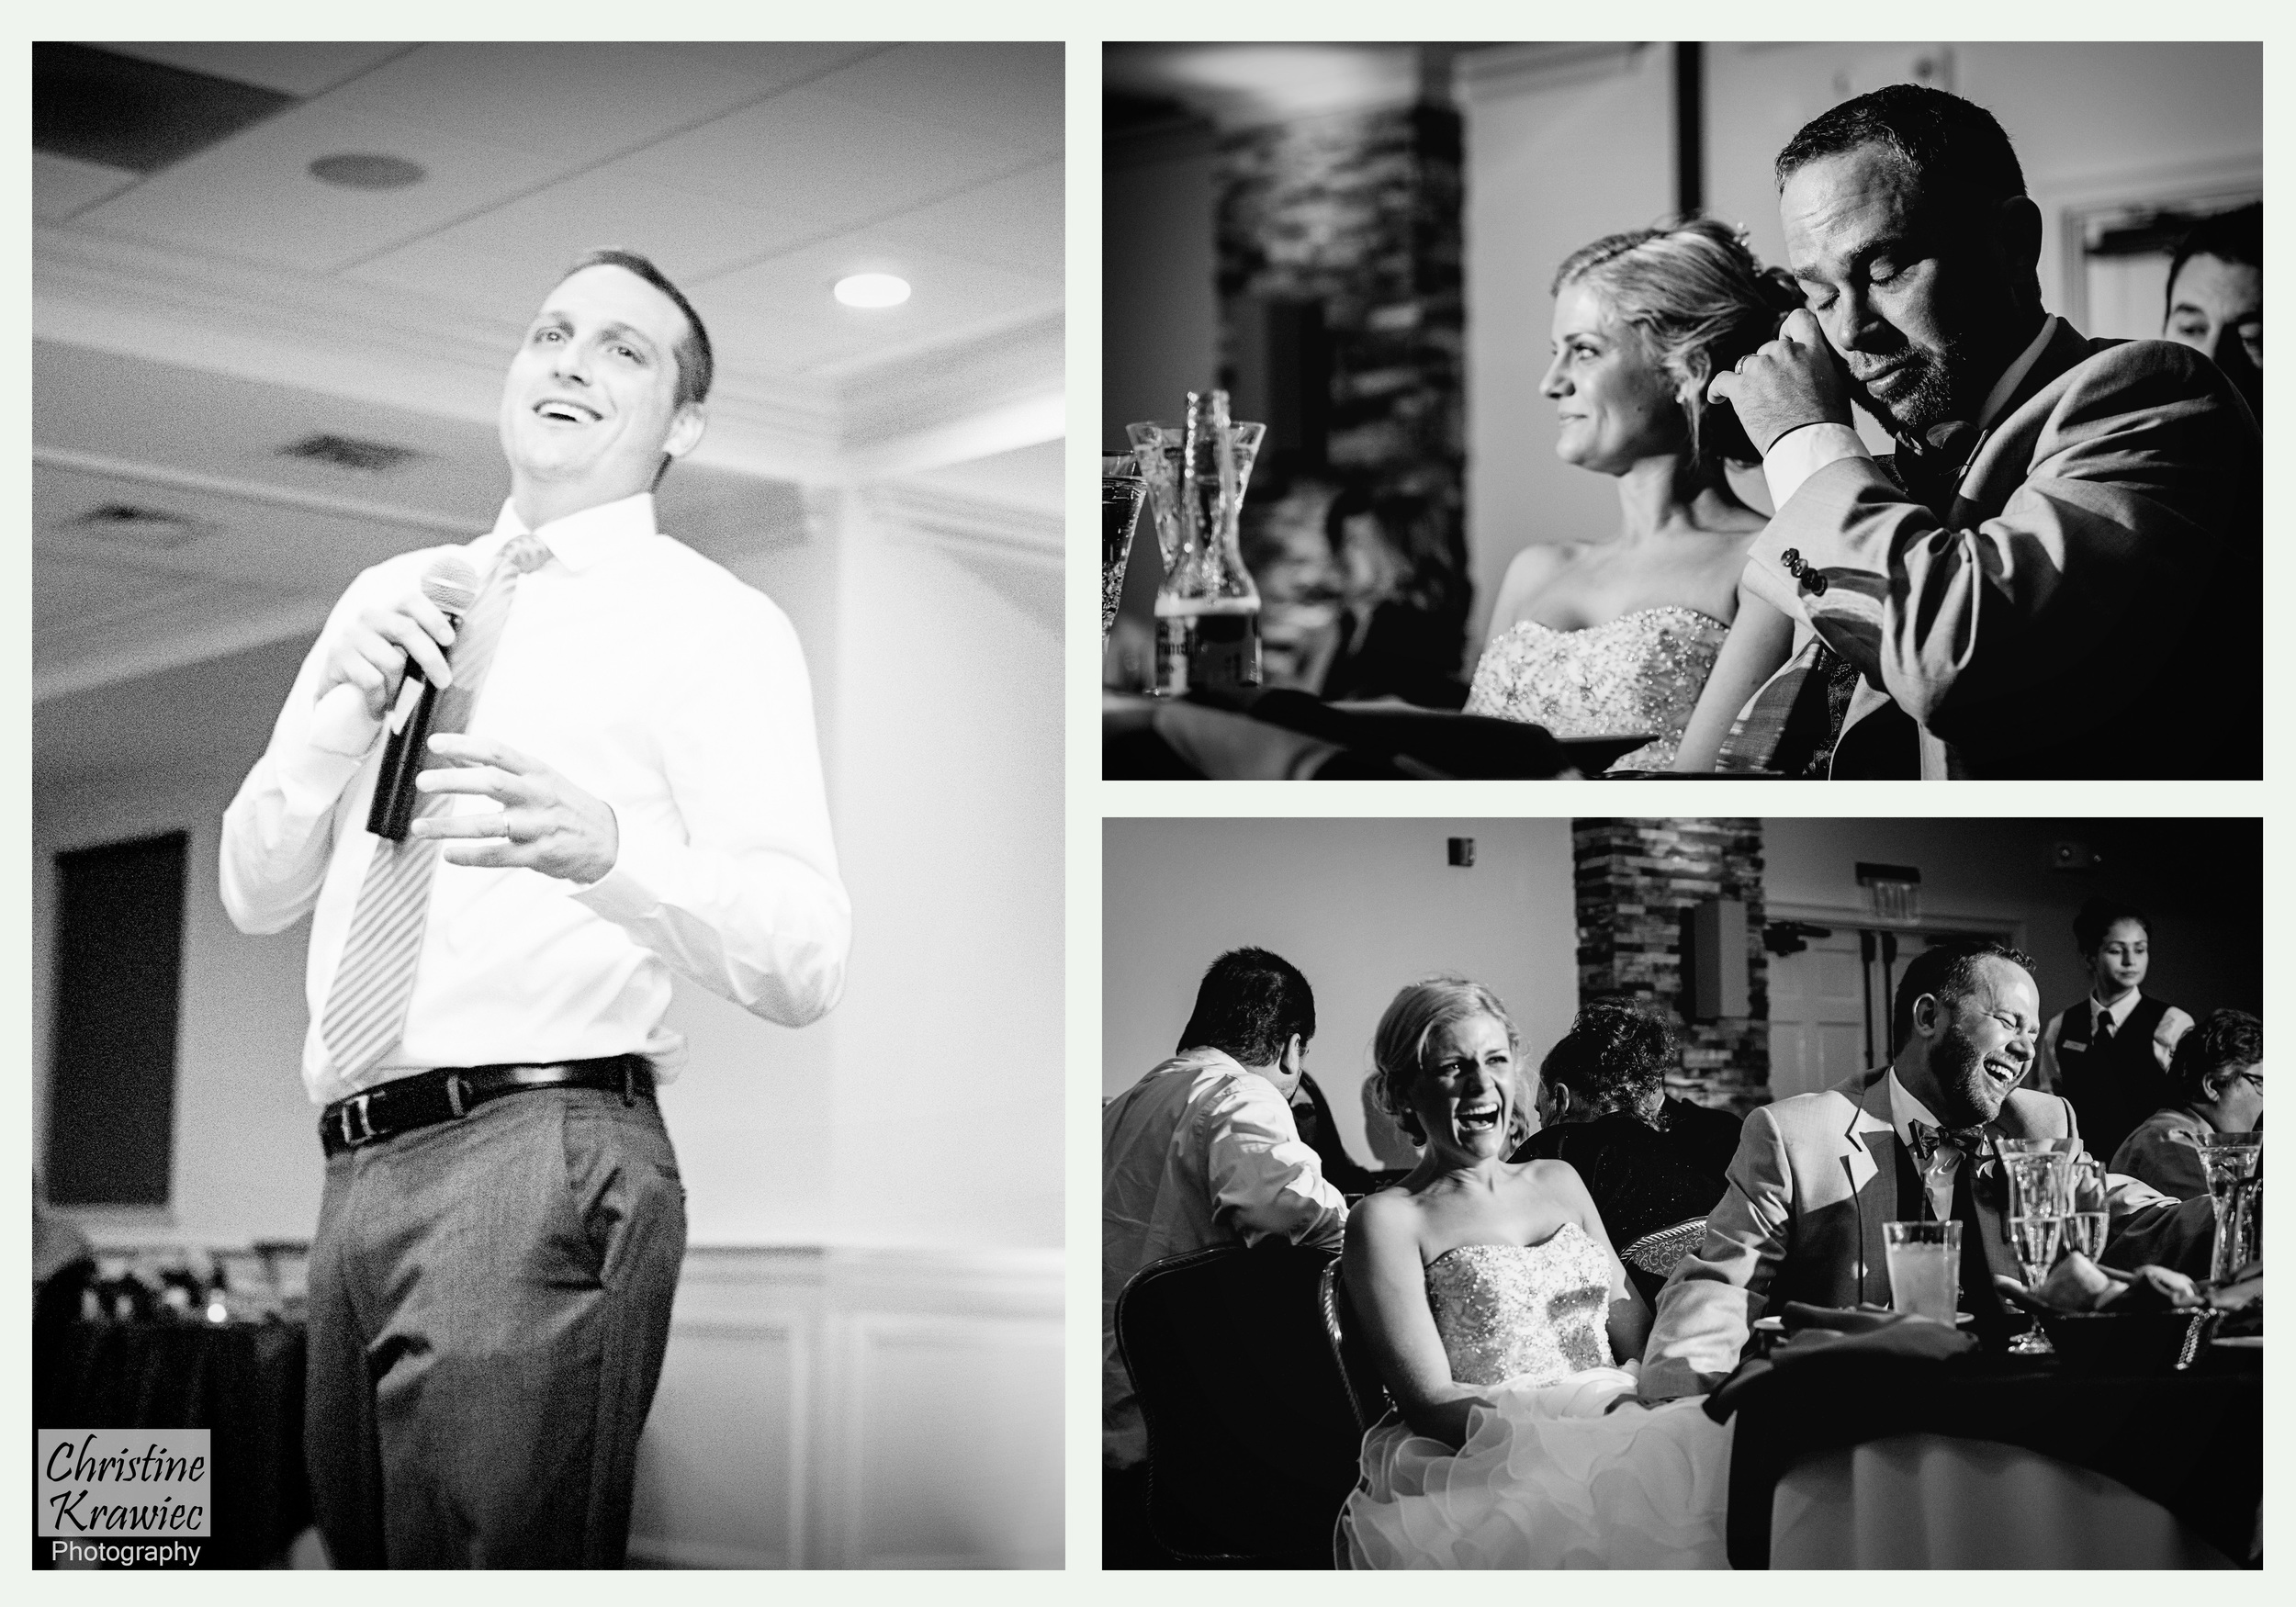 Christine Krawiec Photography - Hartefeld National Golf Club Wedding